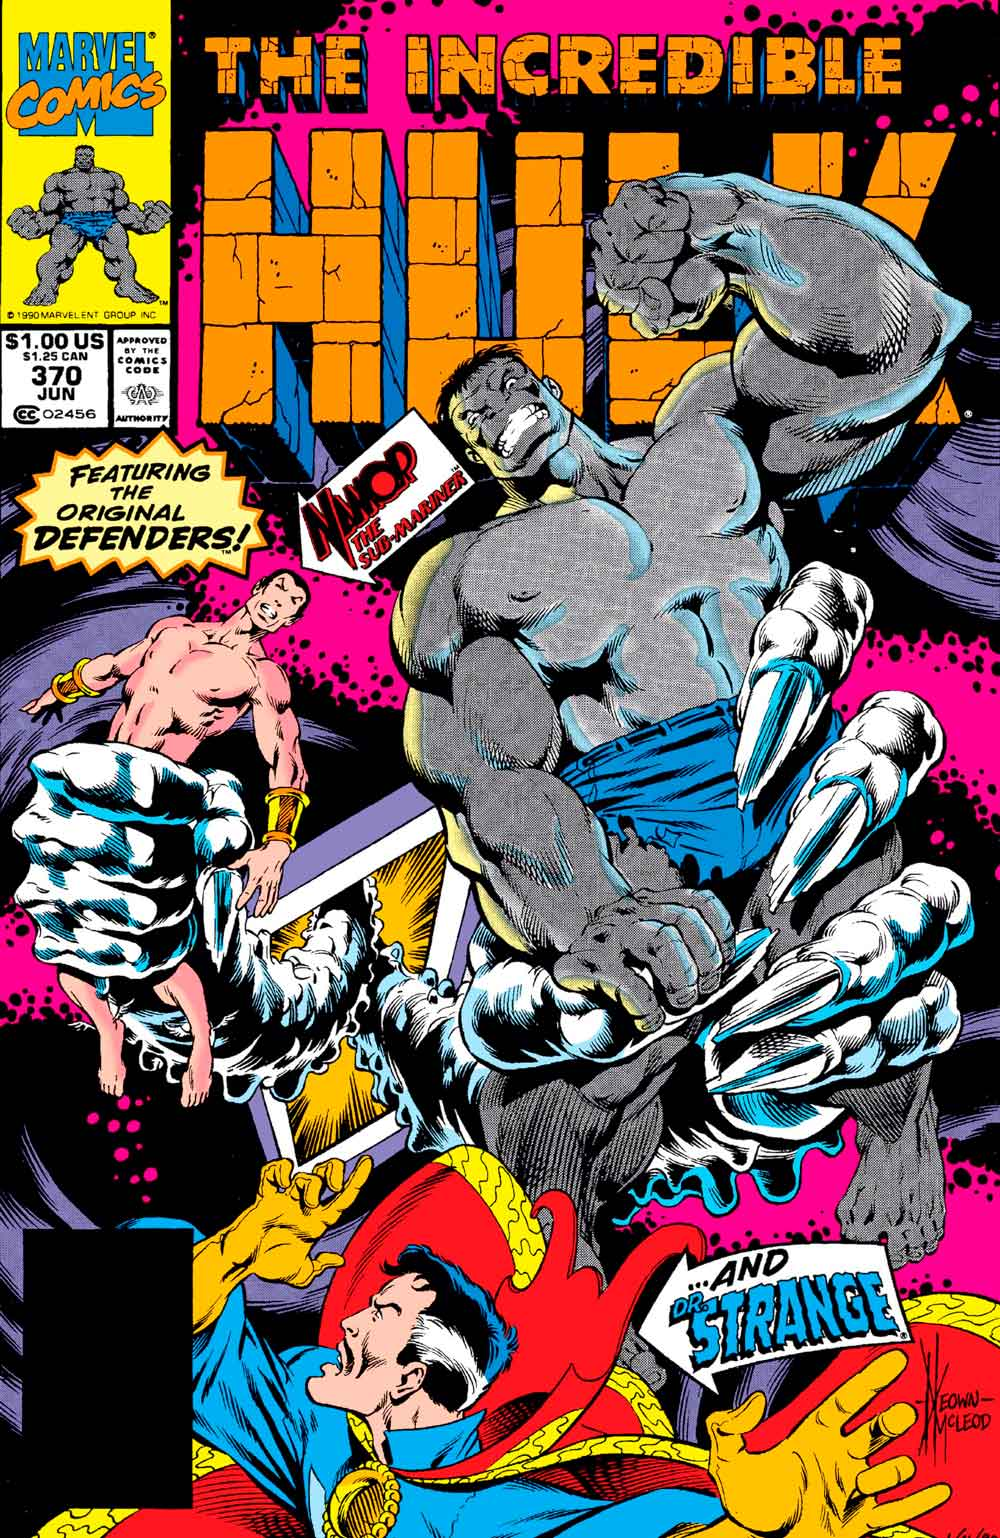 The Incredible Hulk # 370 - Doctor Strange